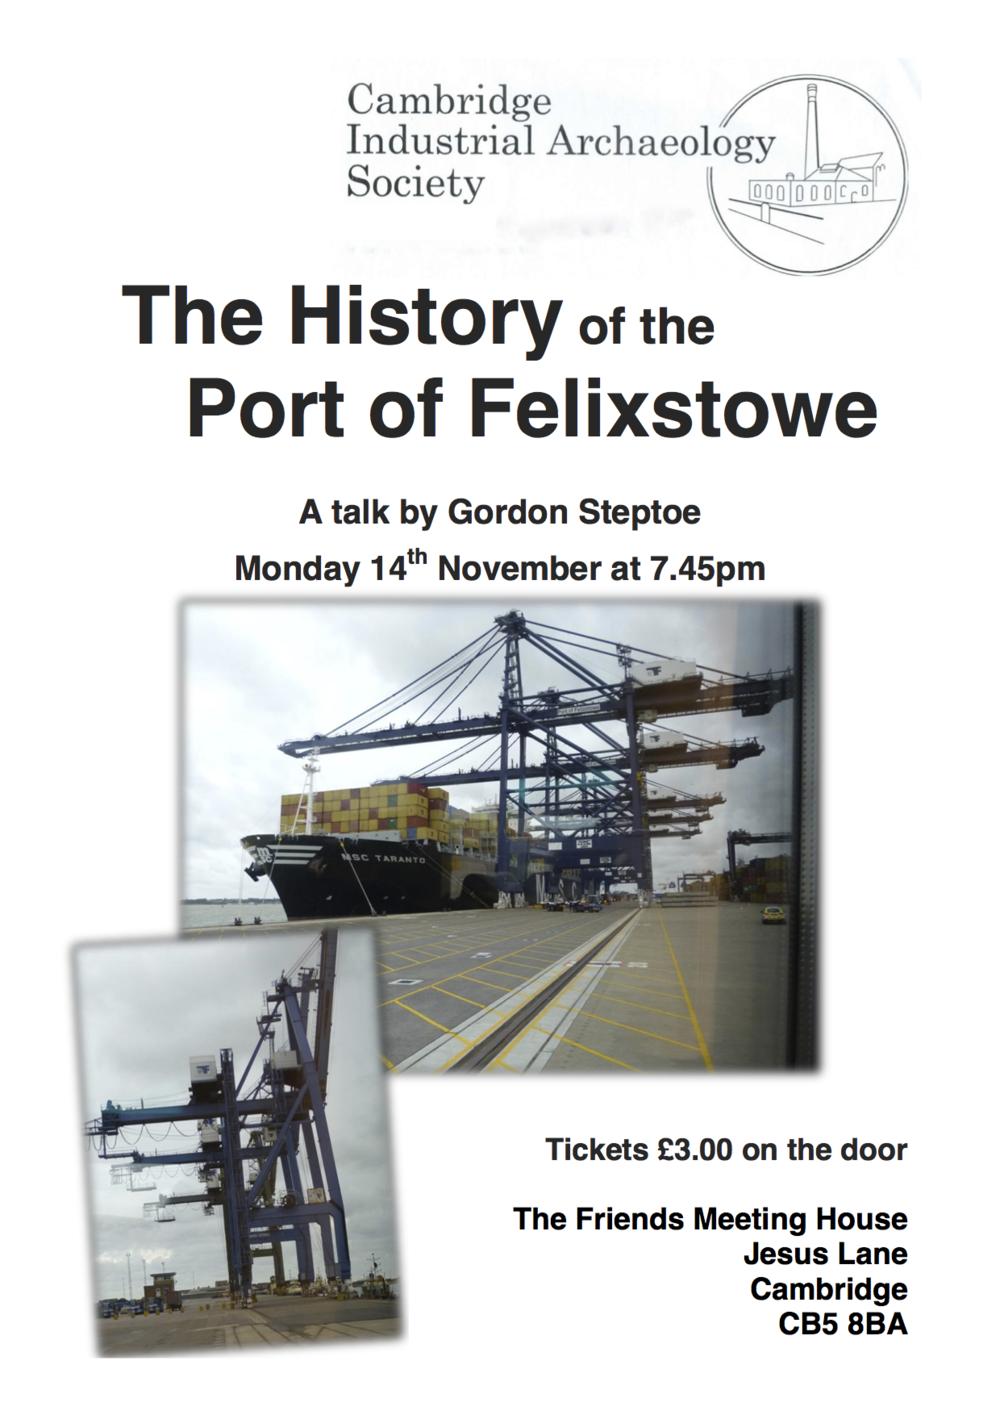 CIAS_Felixstowe_Docks_Poster.png